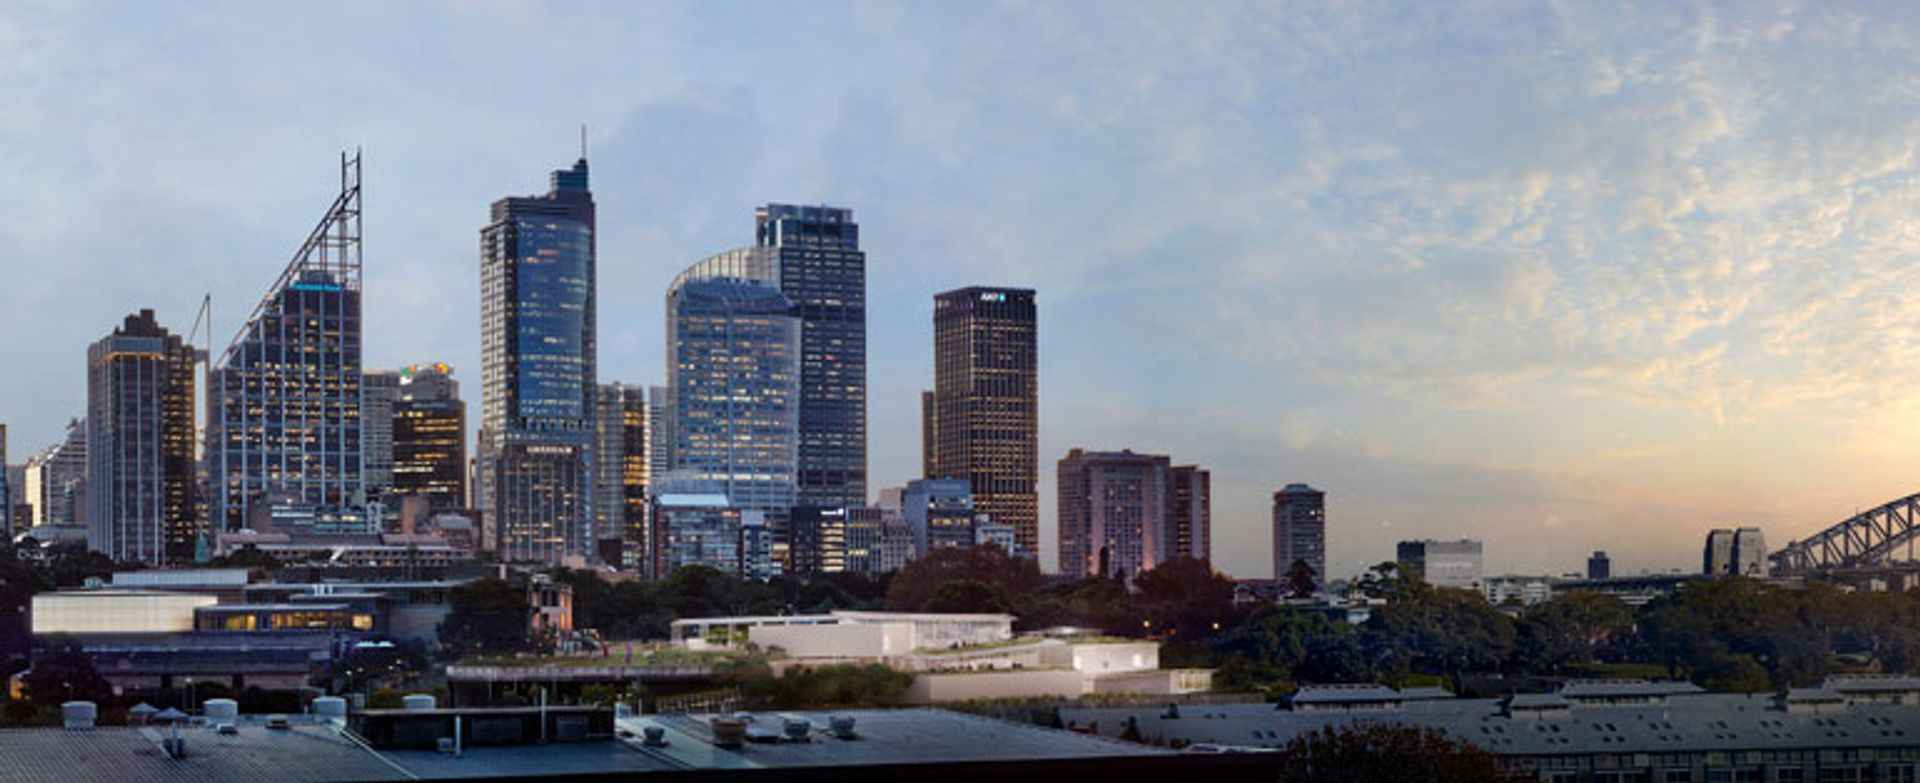 Image of the Sydney Modern Project as produced by Kazuyo Sejima + Ryue Nishizawa / SANAA SANAA